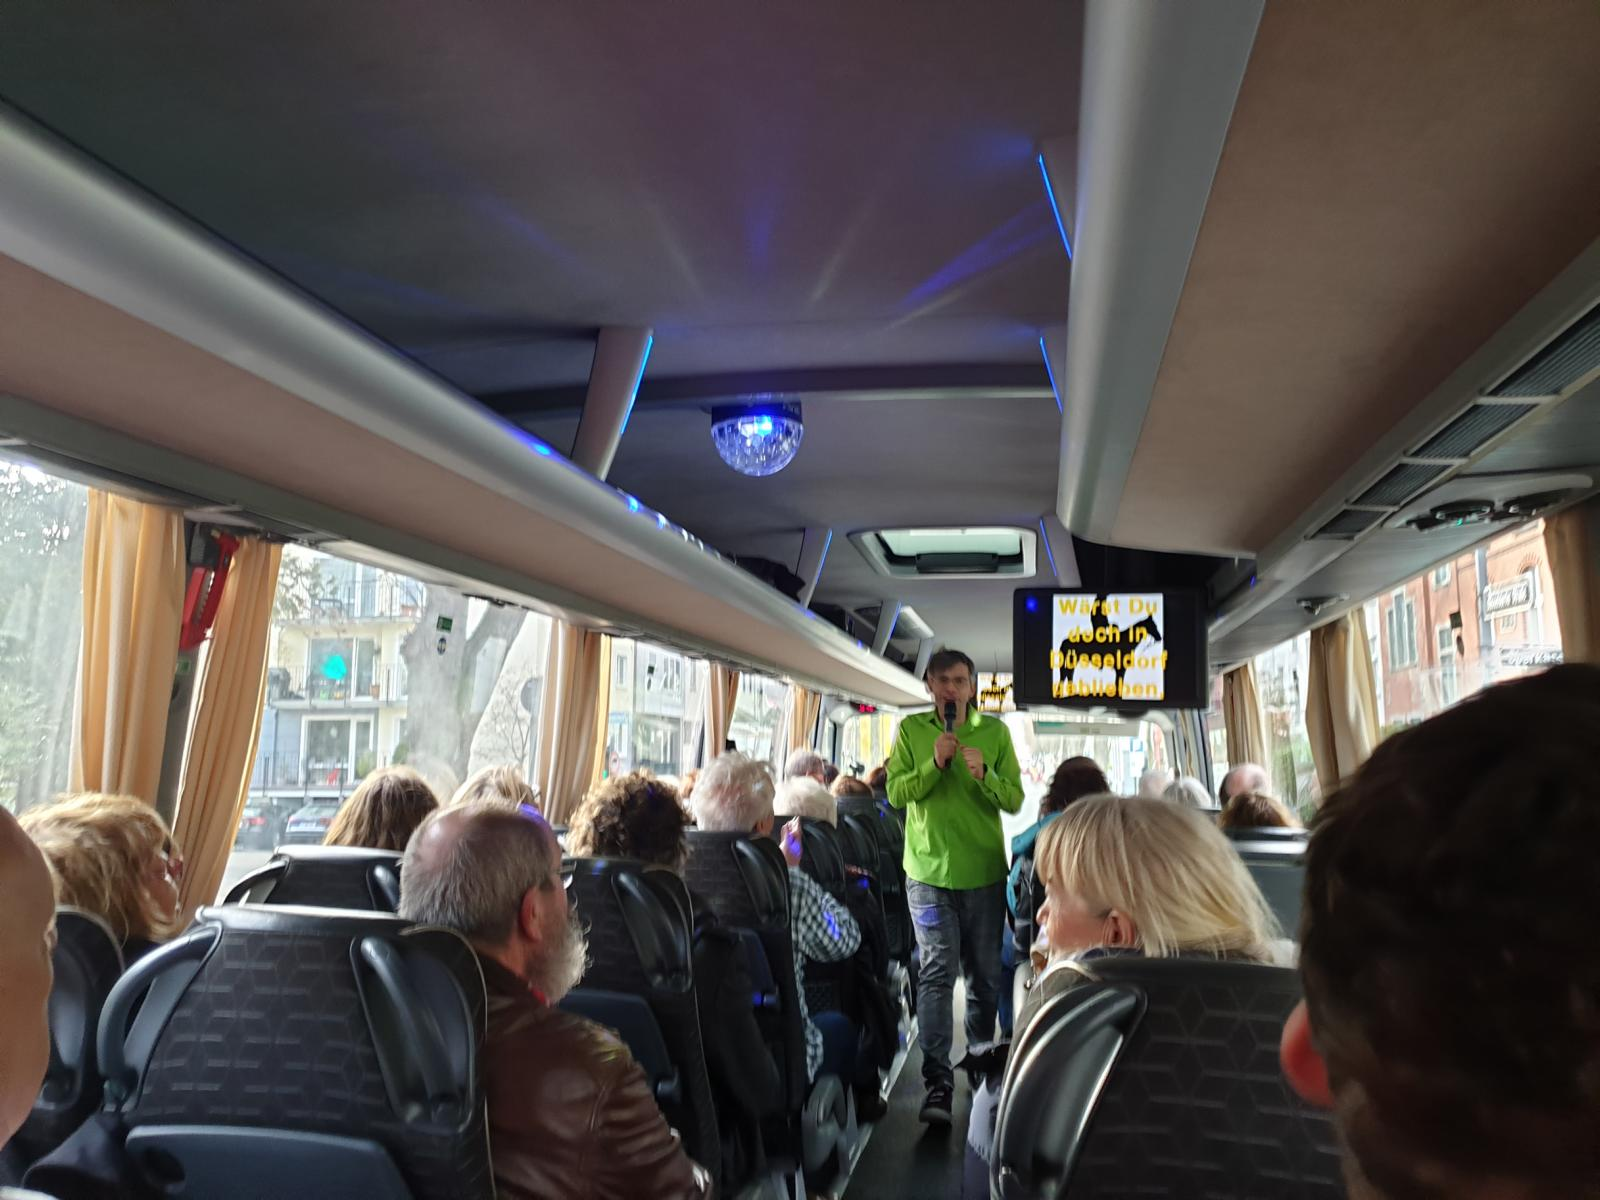 Die Lachexpedition in Düsseldorf – Sightseeing-Tour mal anders